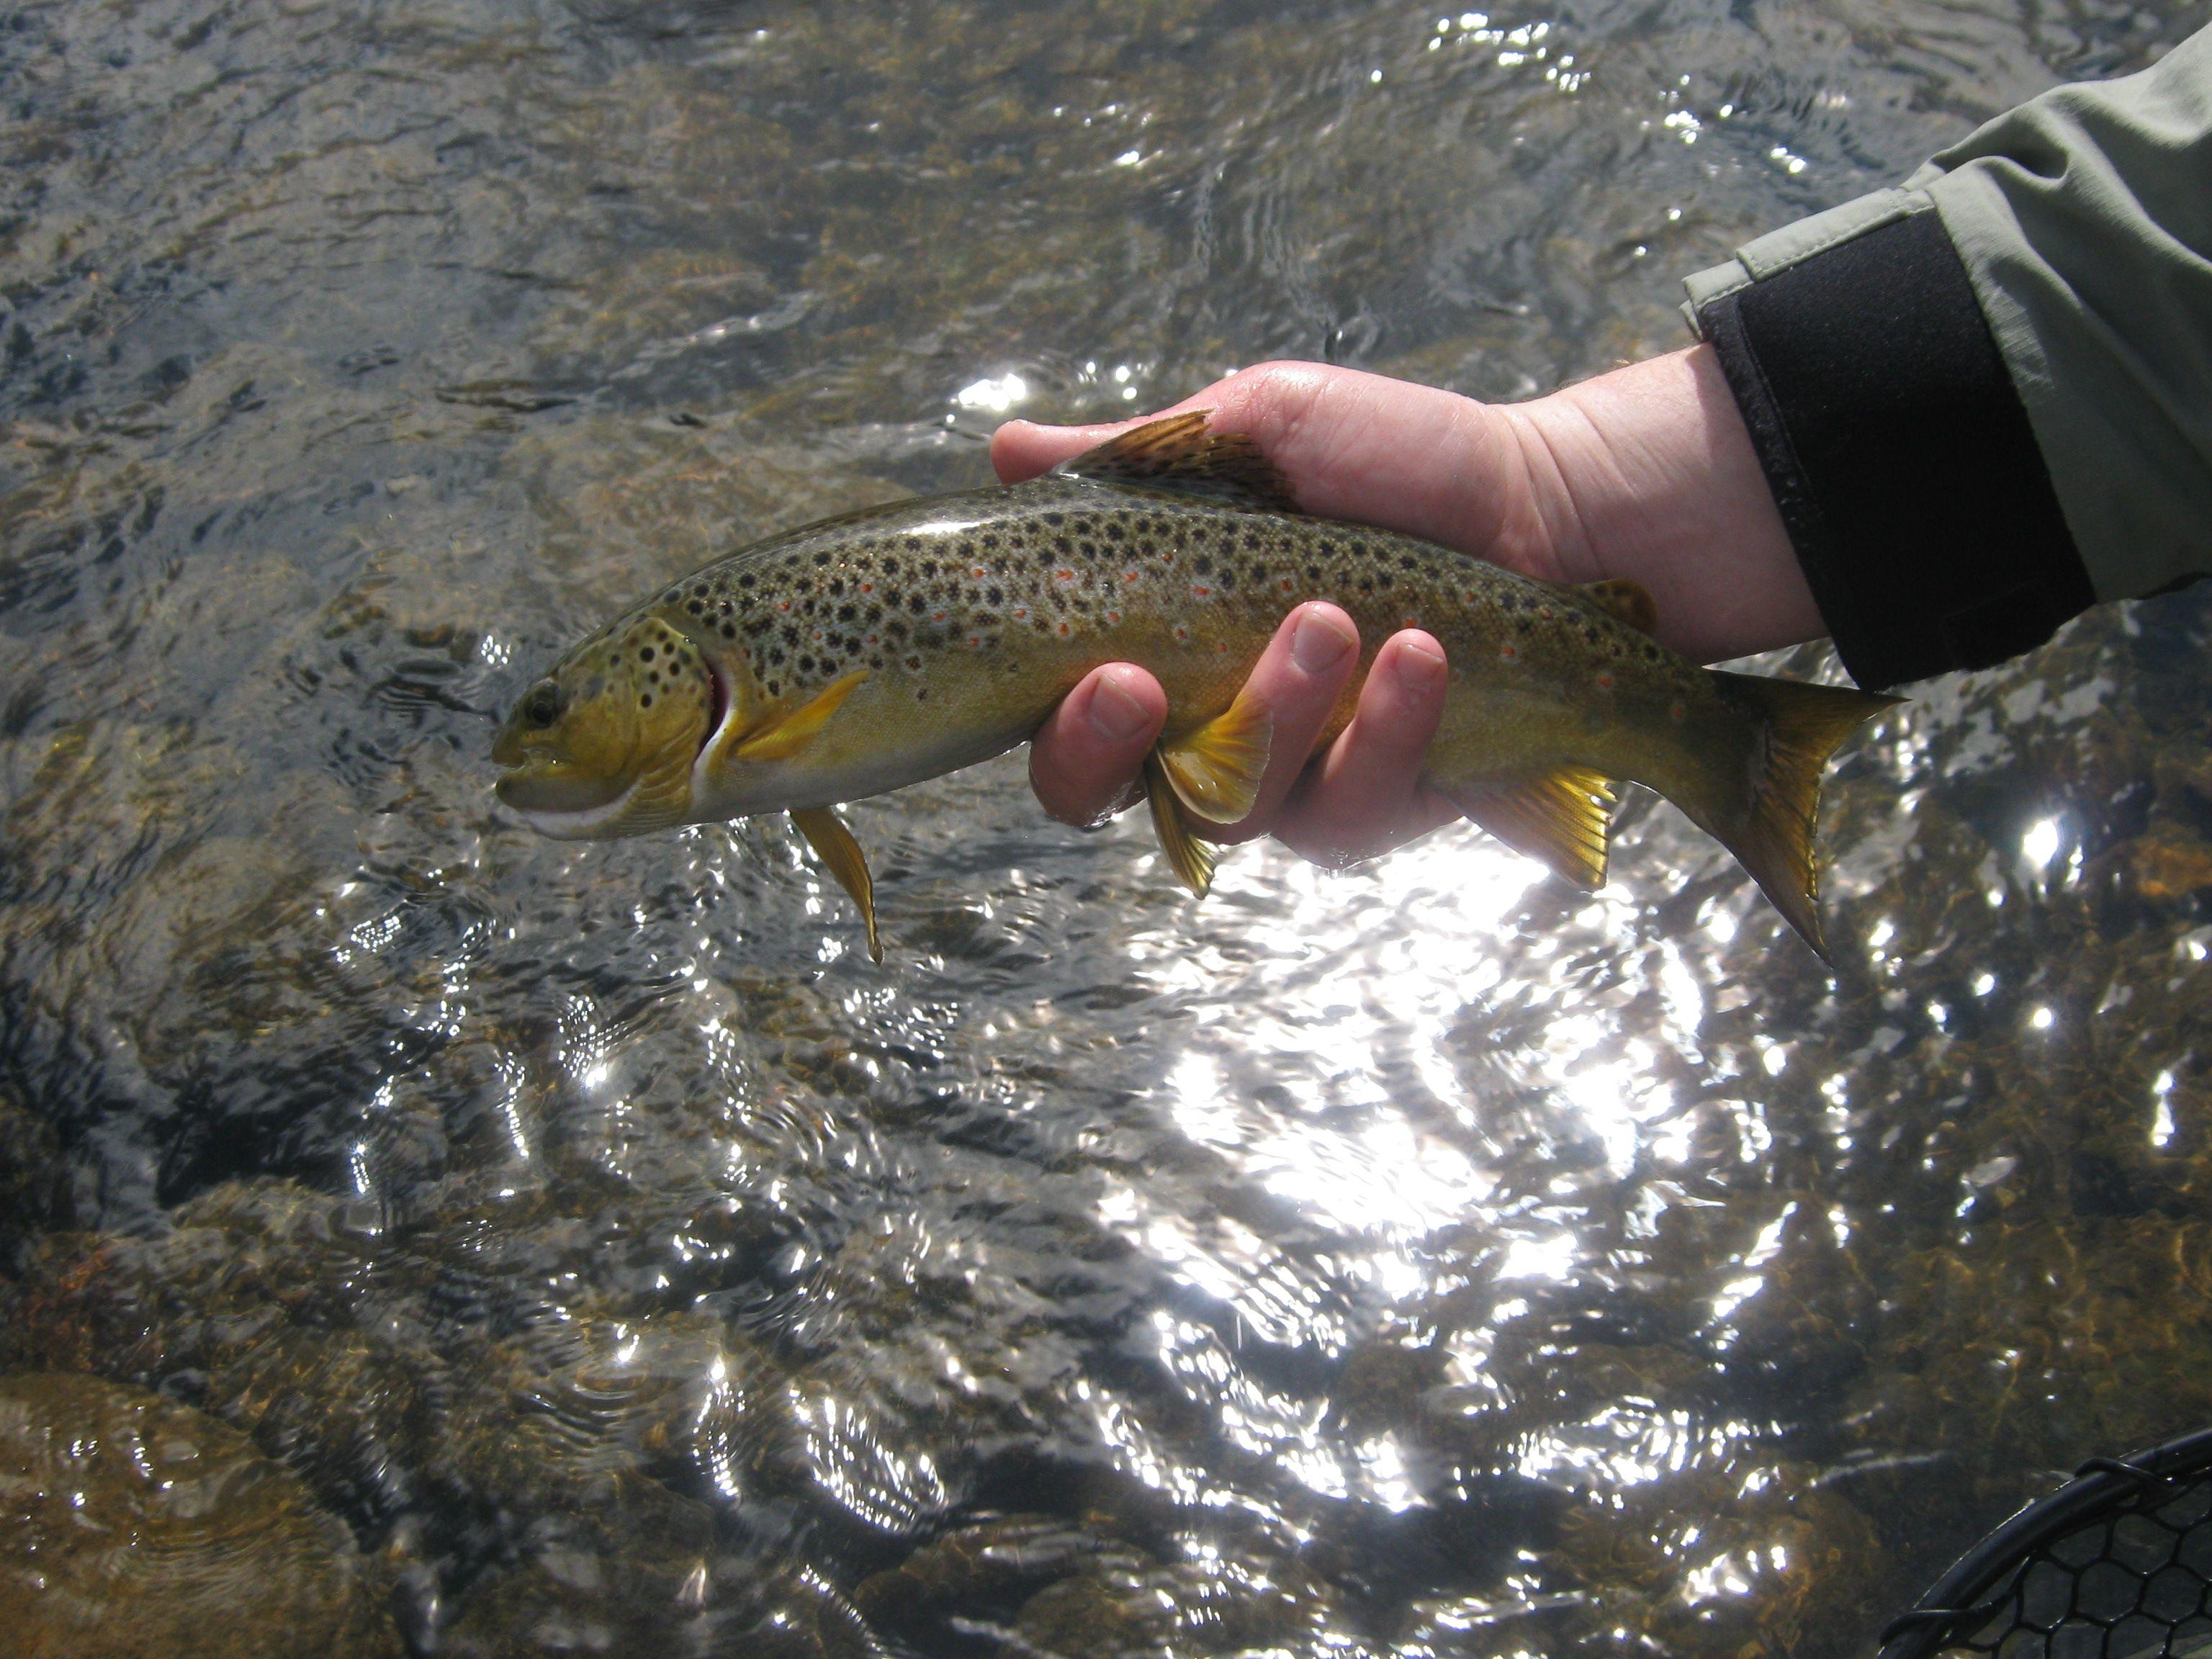 Pin on Utah fishing & hunting